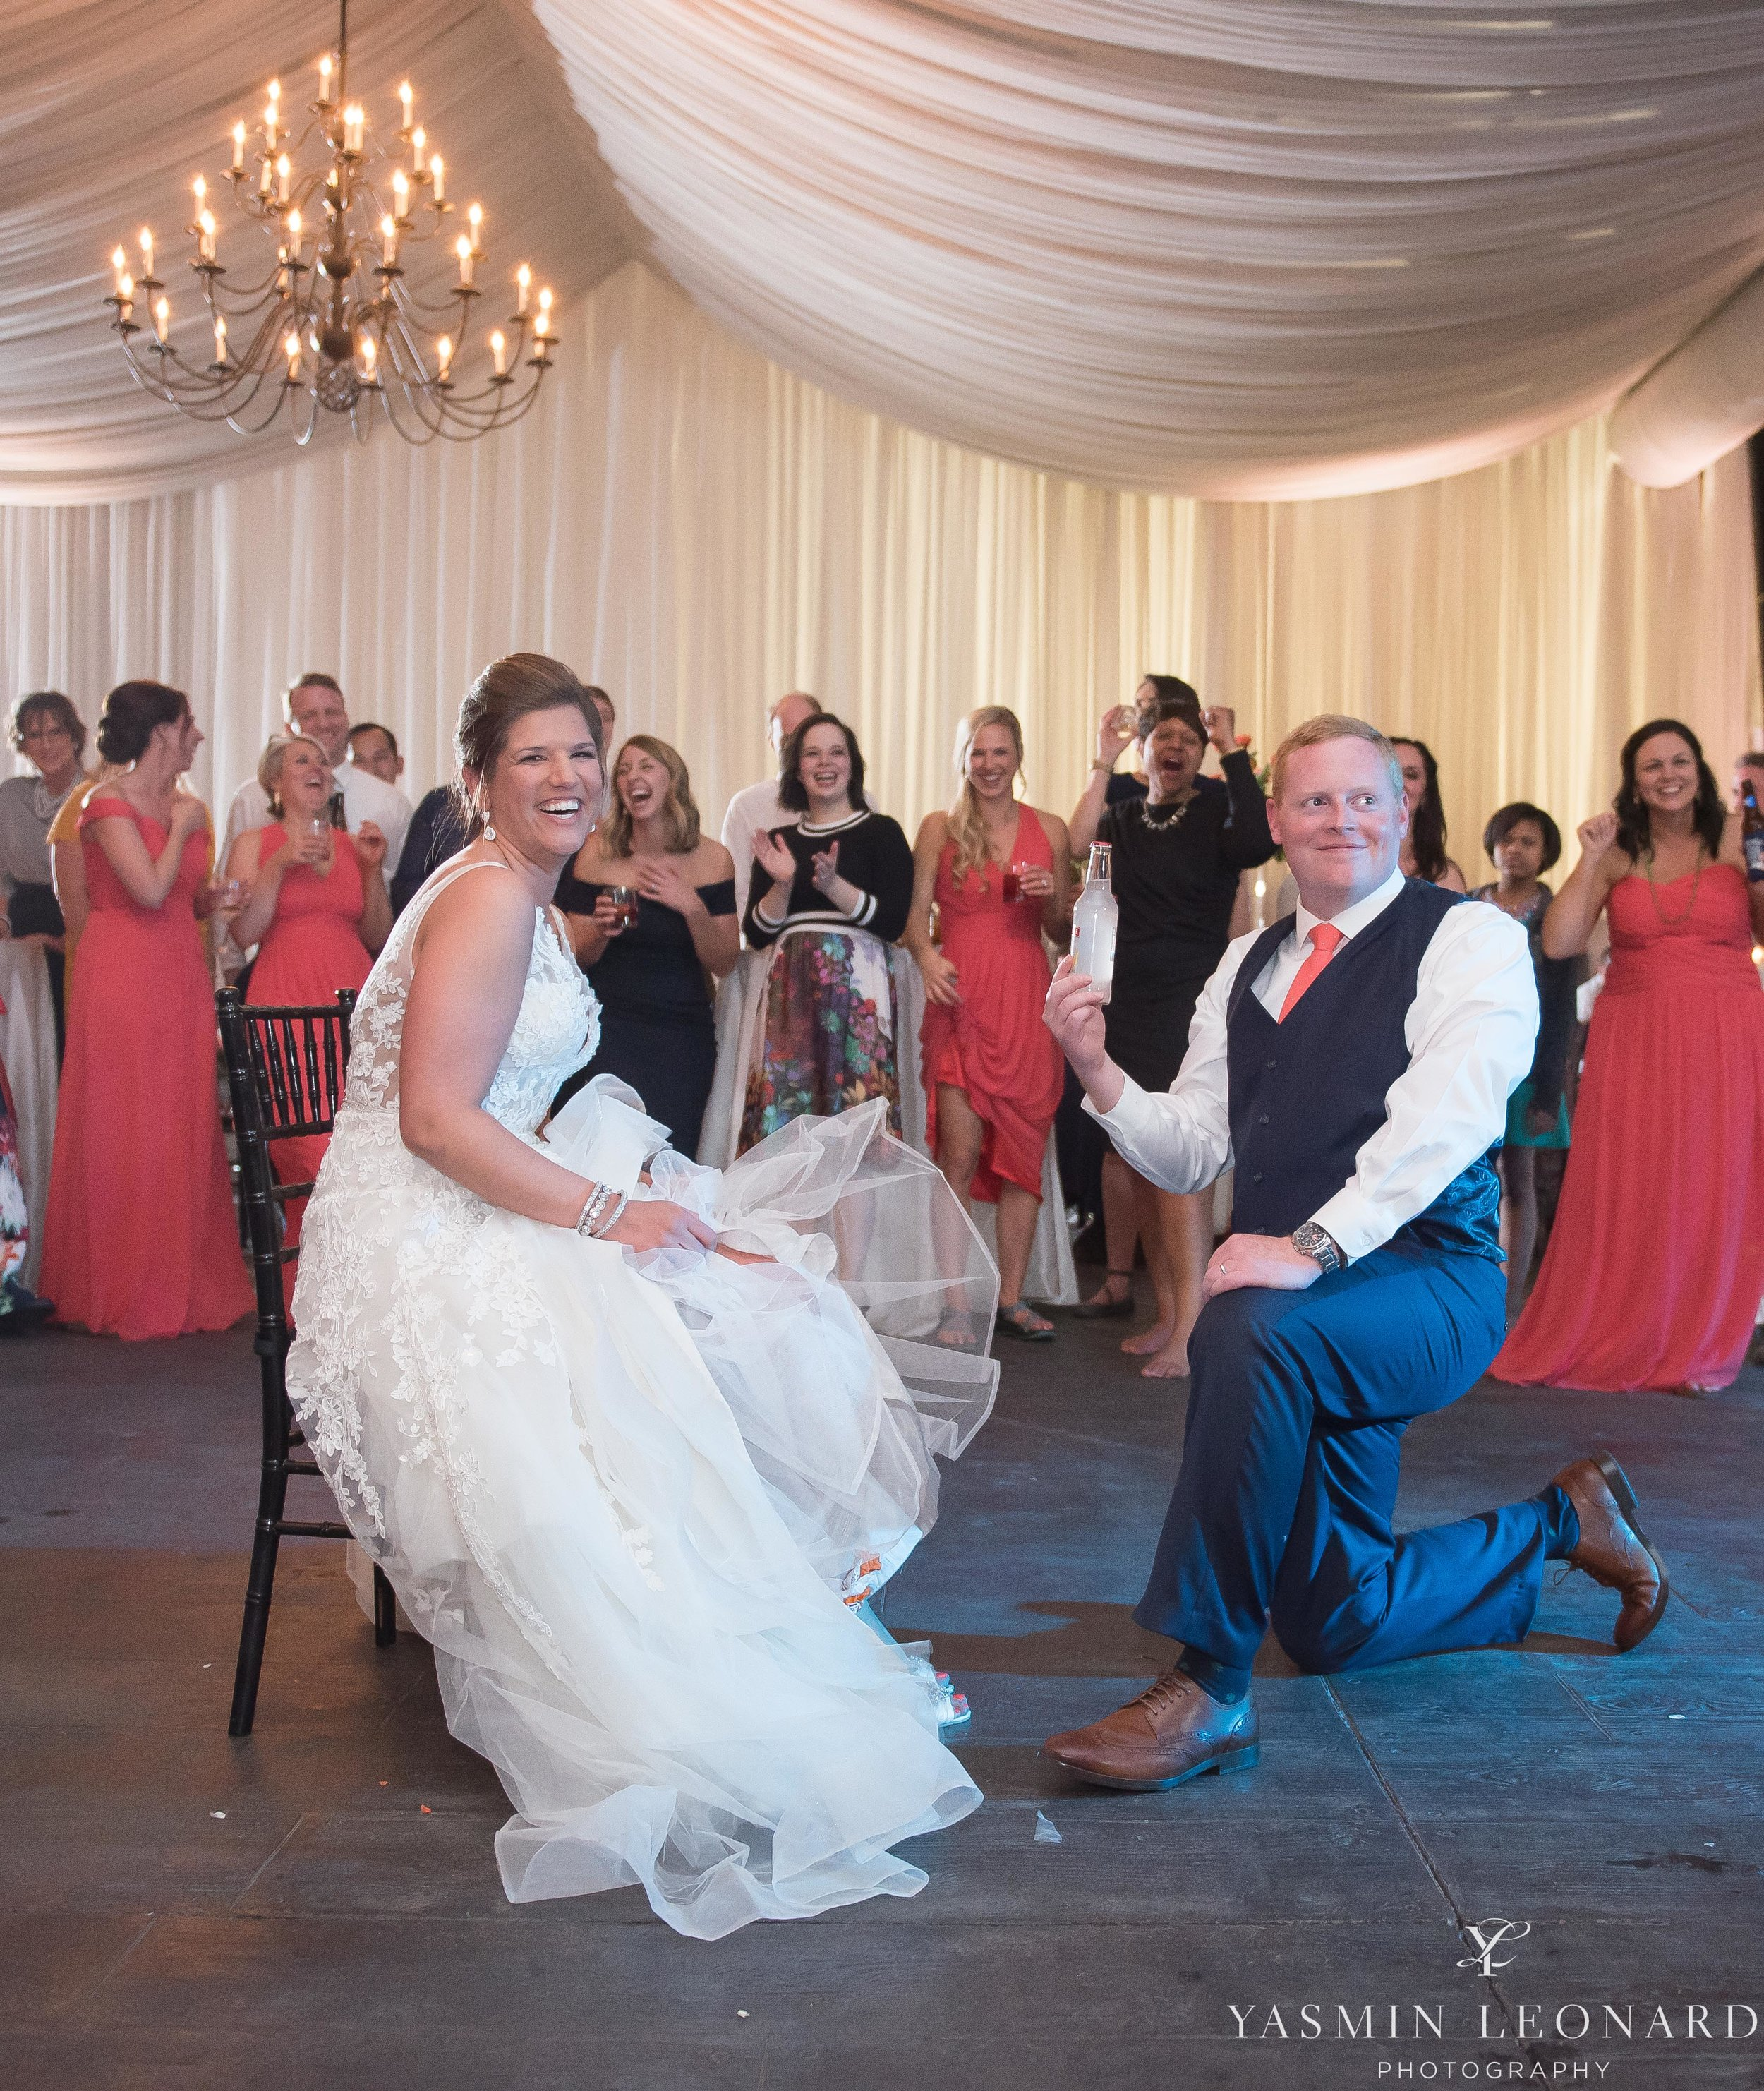 Adaumont Farm - Adaumont Farm Weddings - Trinity Weddings - NC Weddings - Yasmin Leonard Photography-95.jpg